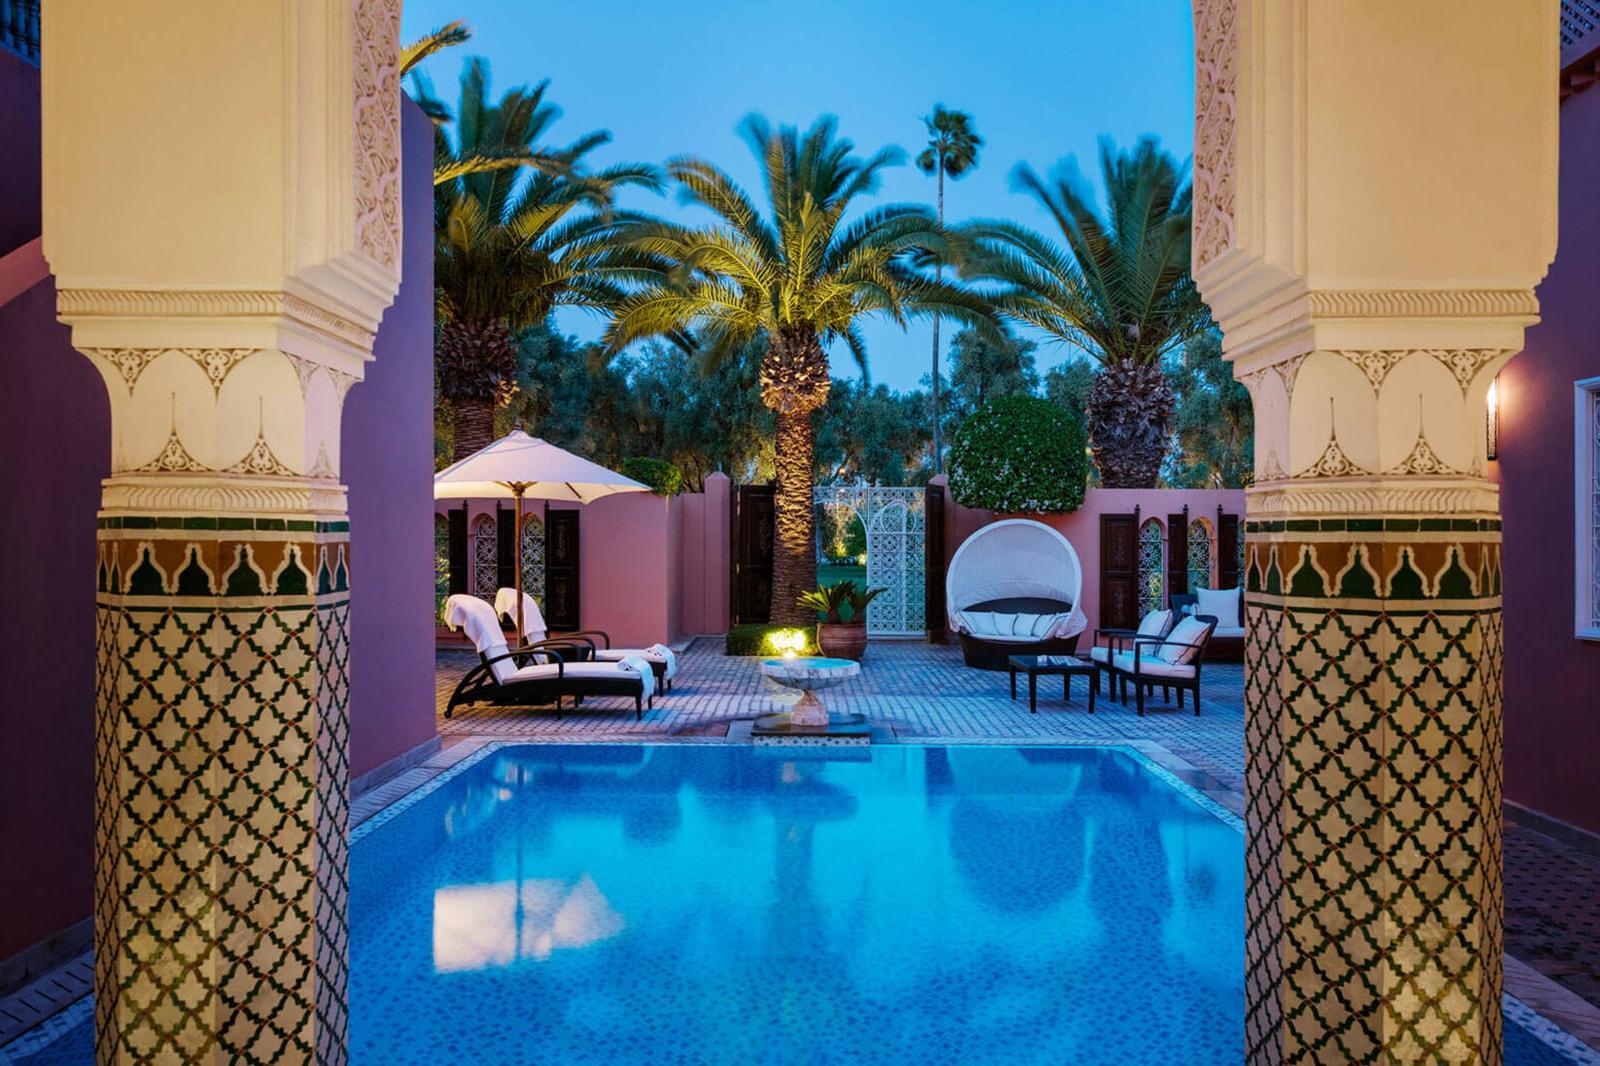 Amangiri Aman Utah Most Beautiful Hotel Best Luxury Resort Swimming Pool Lounge Desert Canyons